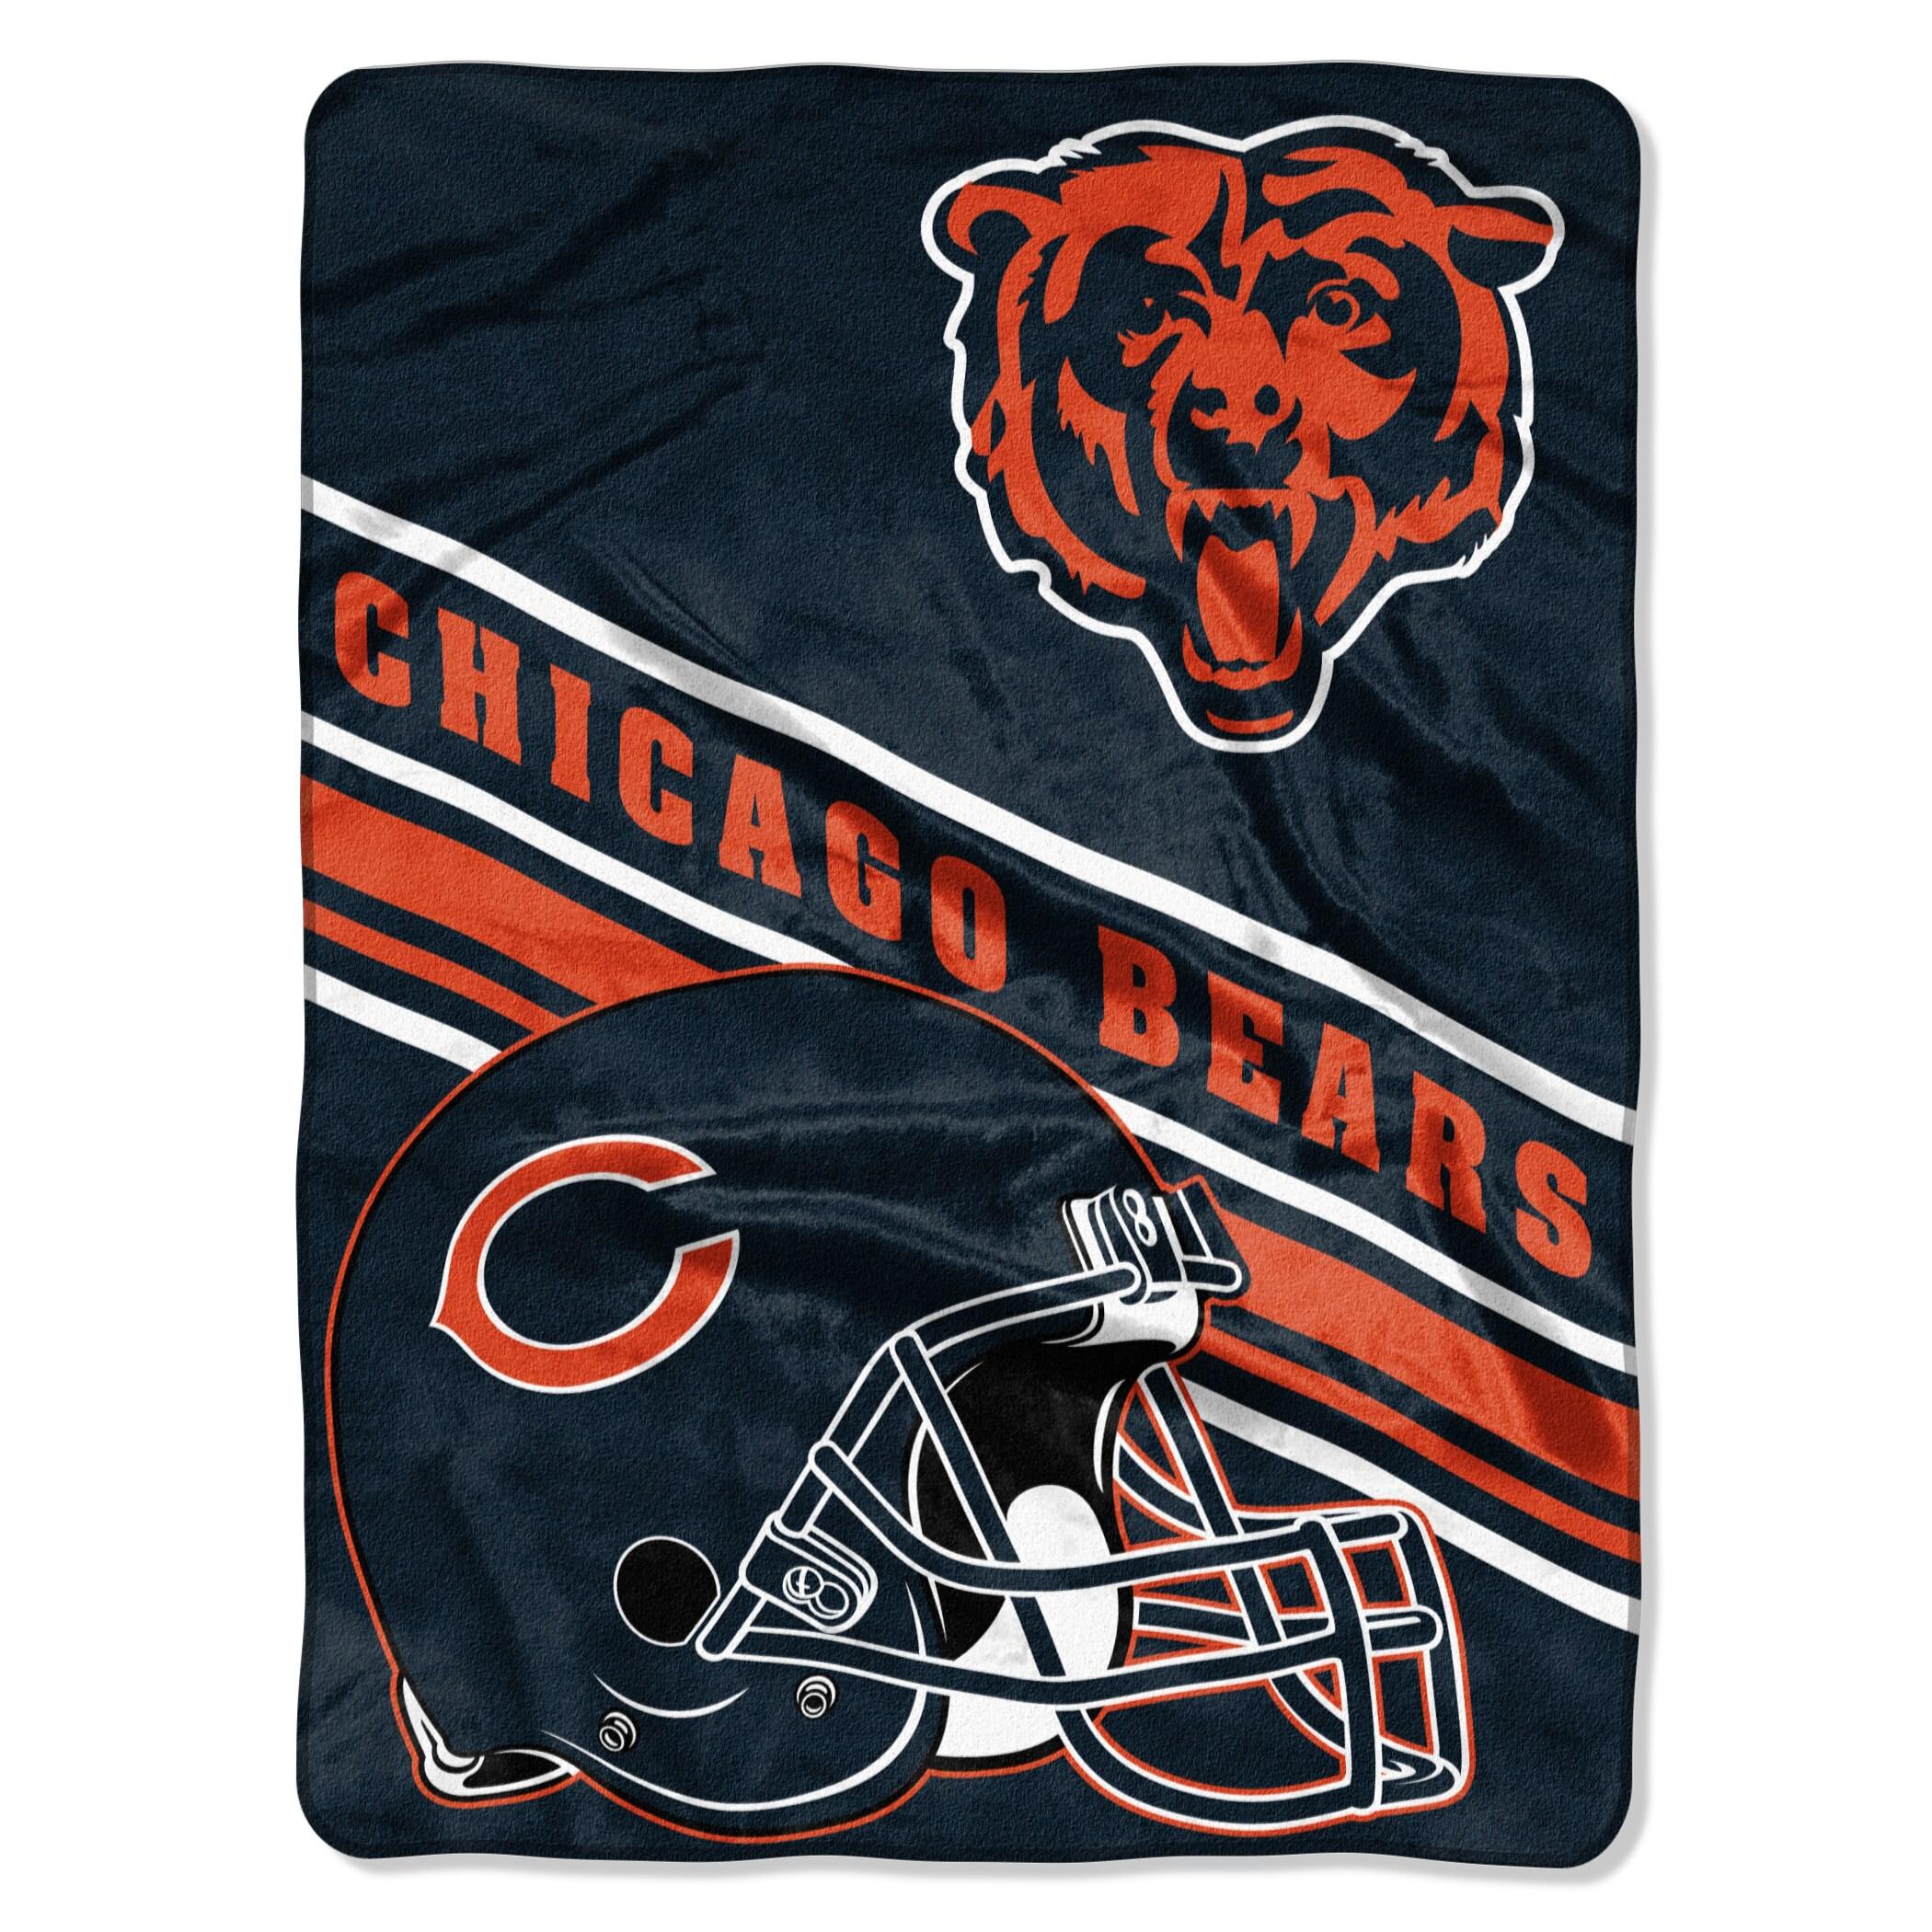 Chicago Bears The Northwest Company 60'' x 80'' Slant Rashcel Throw